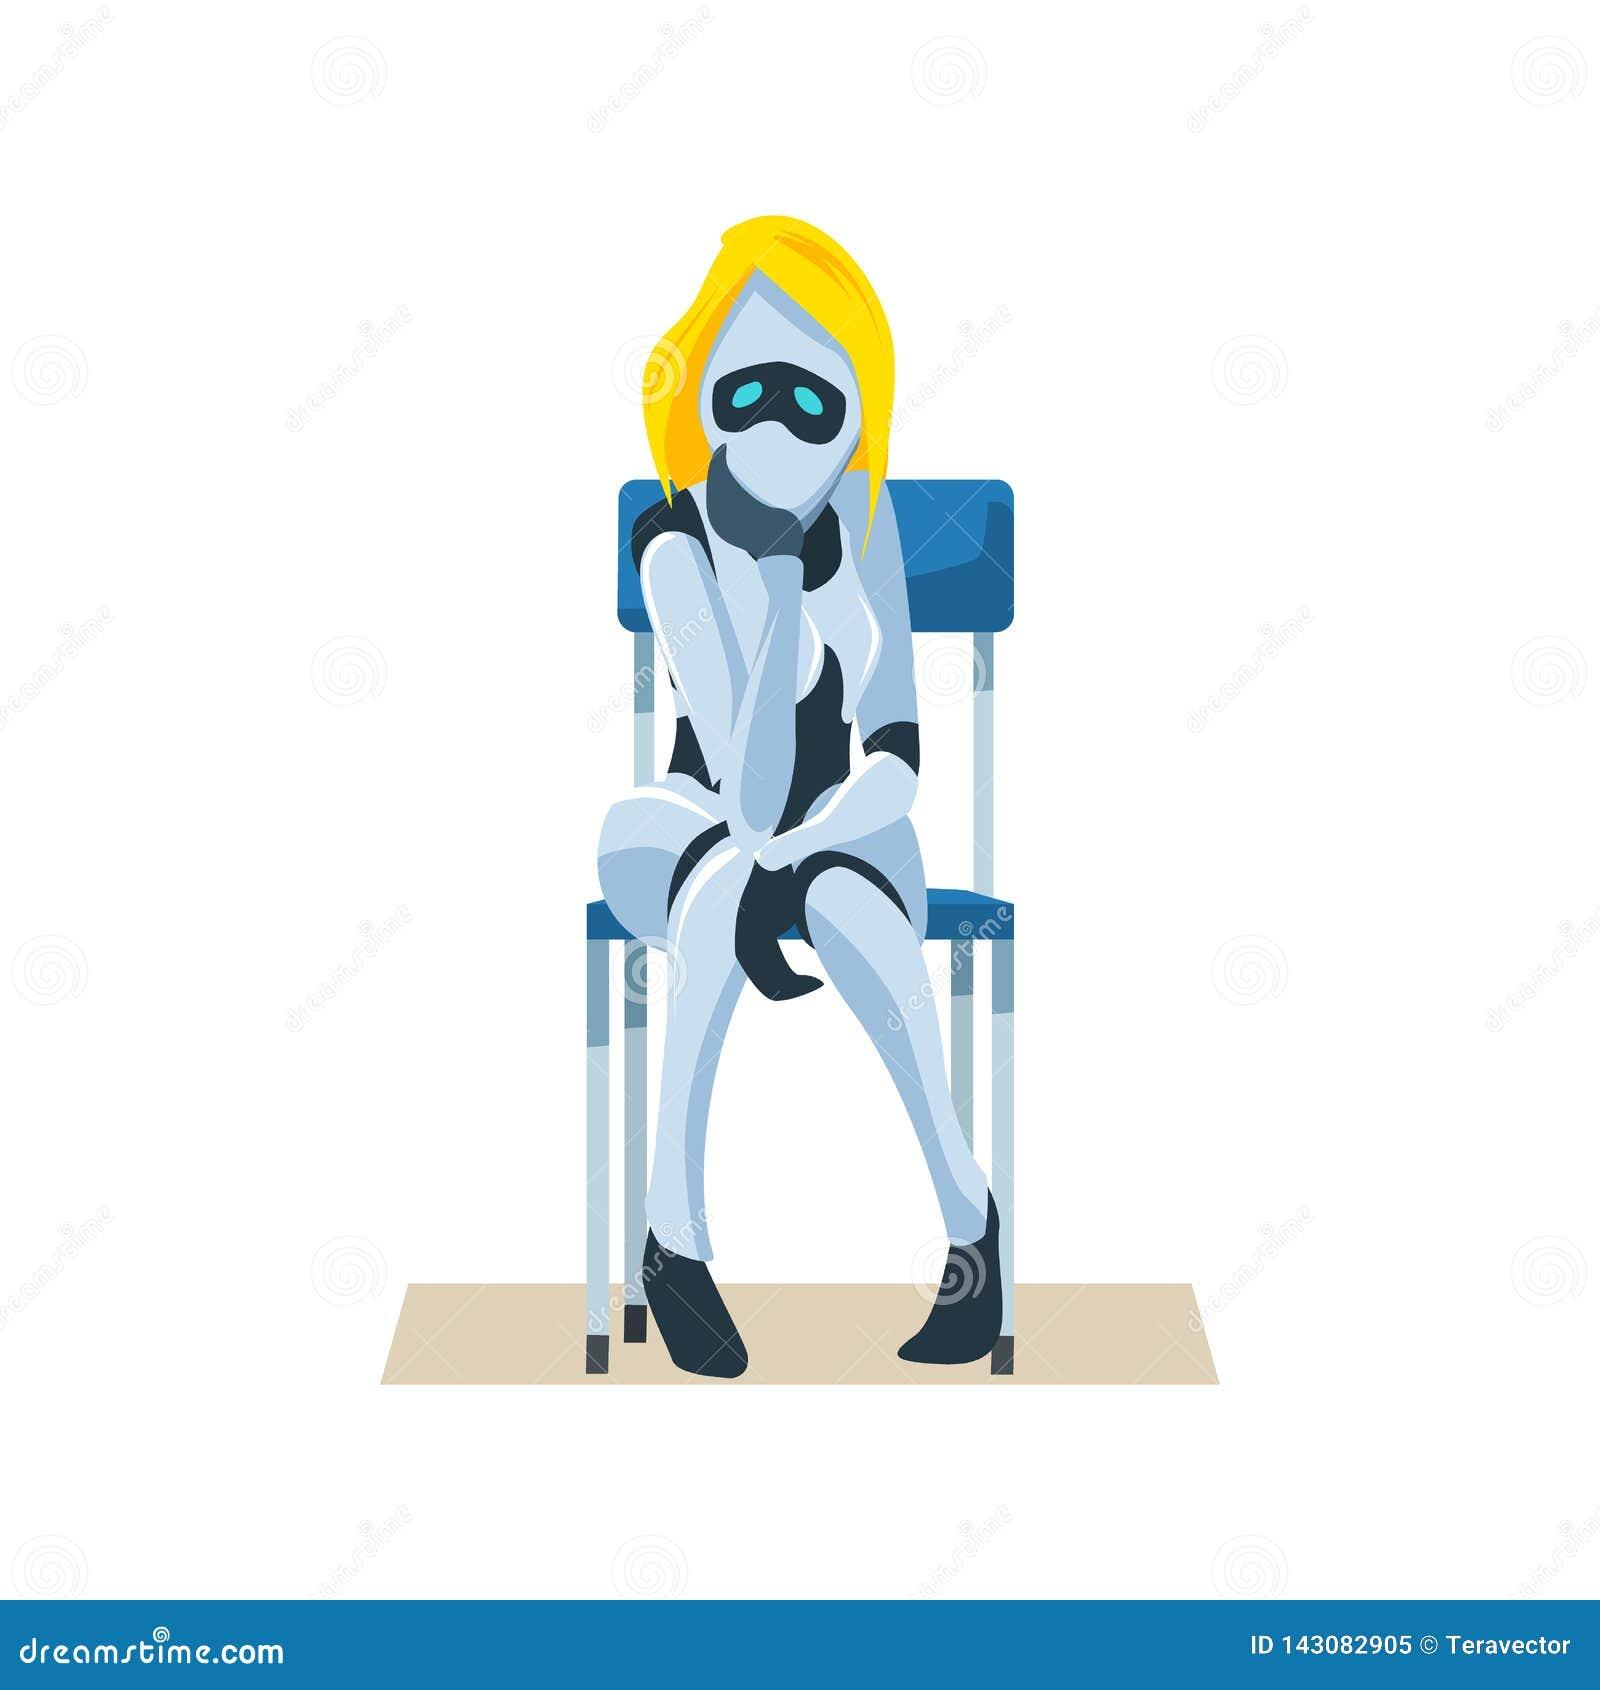 Worried Female Robot on Chair Wait Job Interview